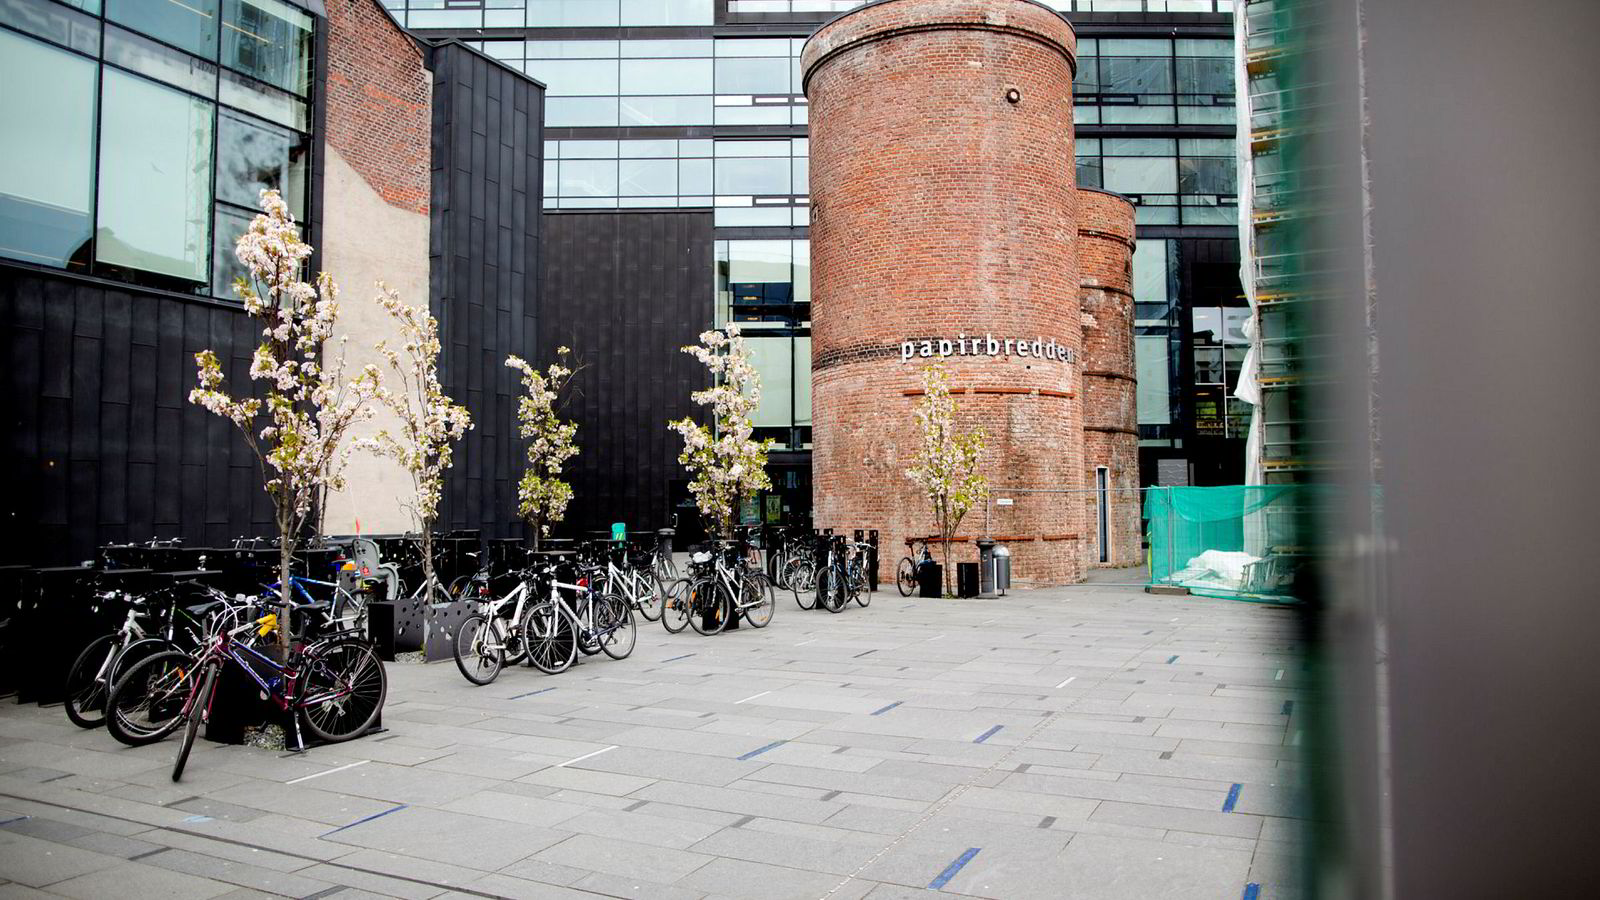 8f967d20 Sykepleierstudiet ved Høgskolen i Sørøst-Norge er et av Norges mest  populære studier i årets